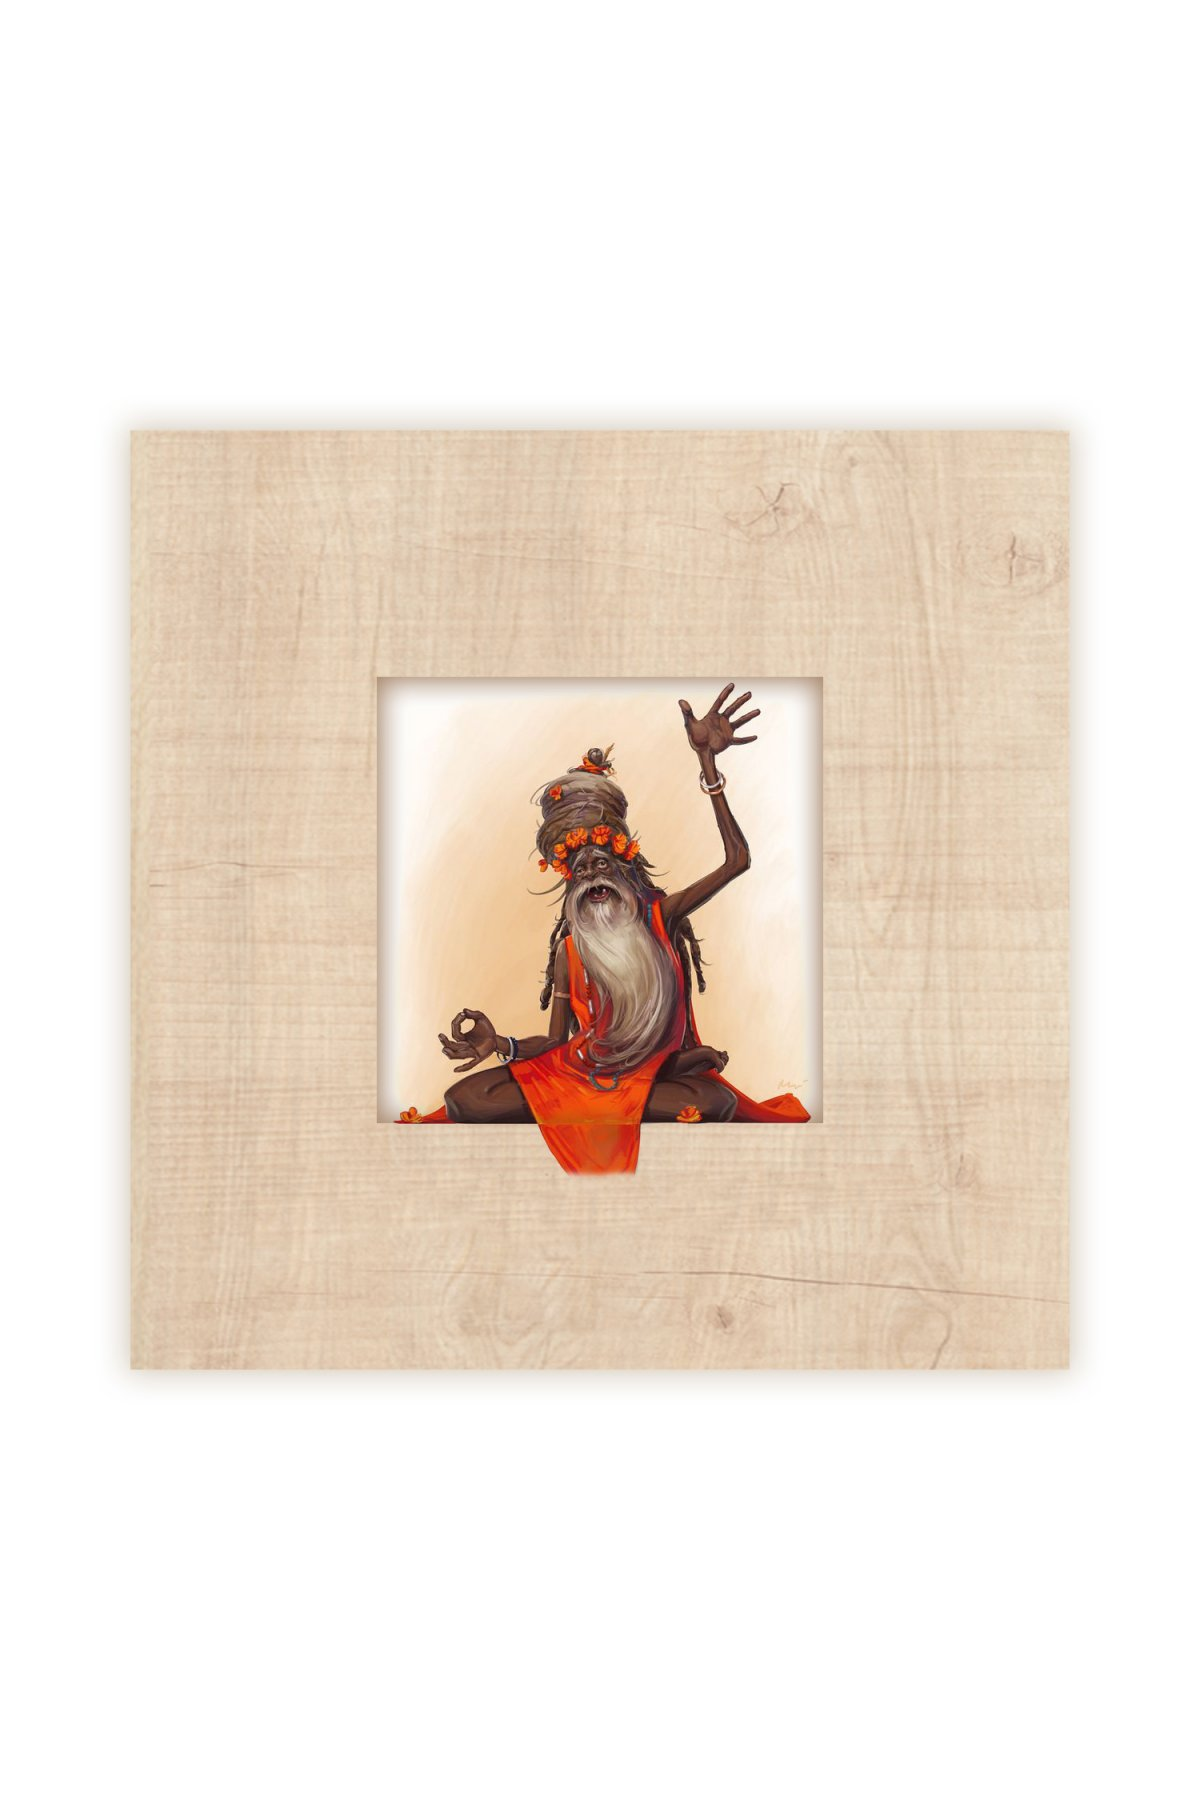 Evsimo Decorative Wooden Frame Hk -108